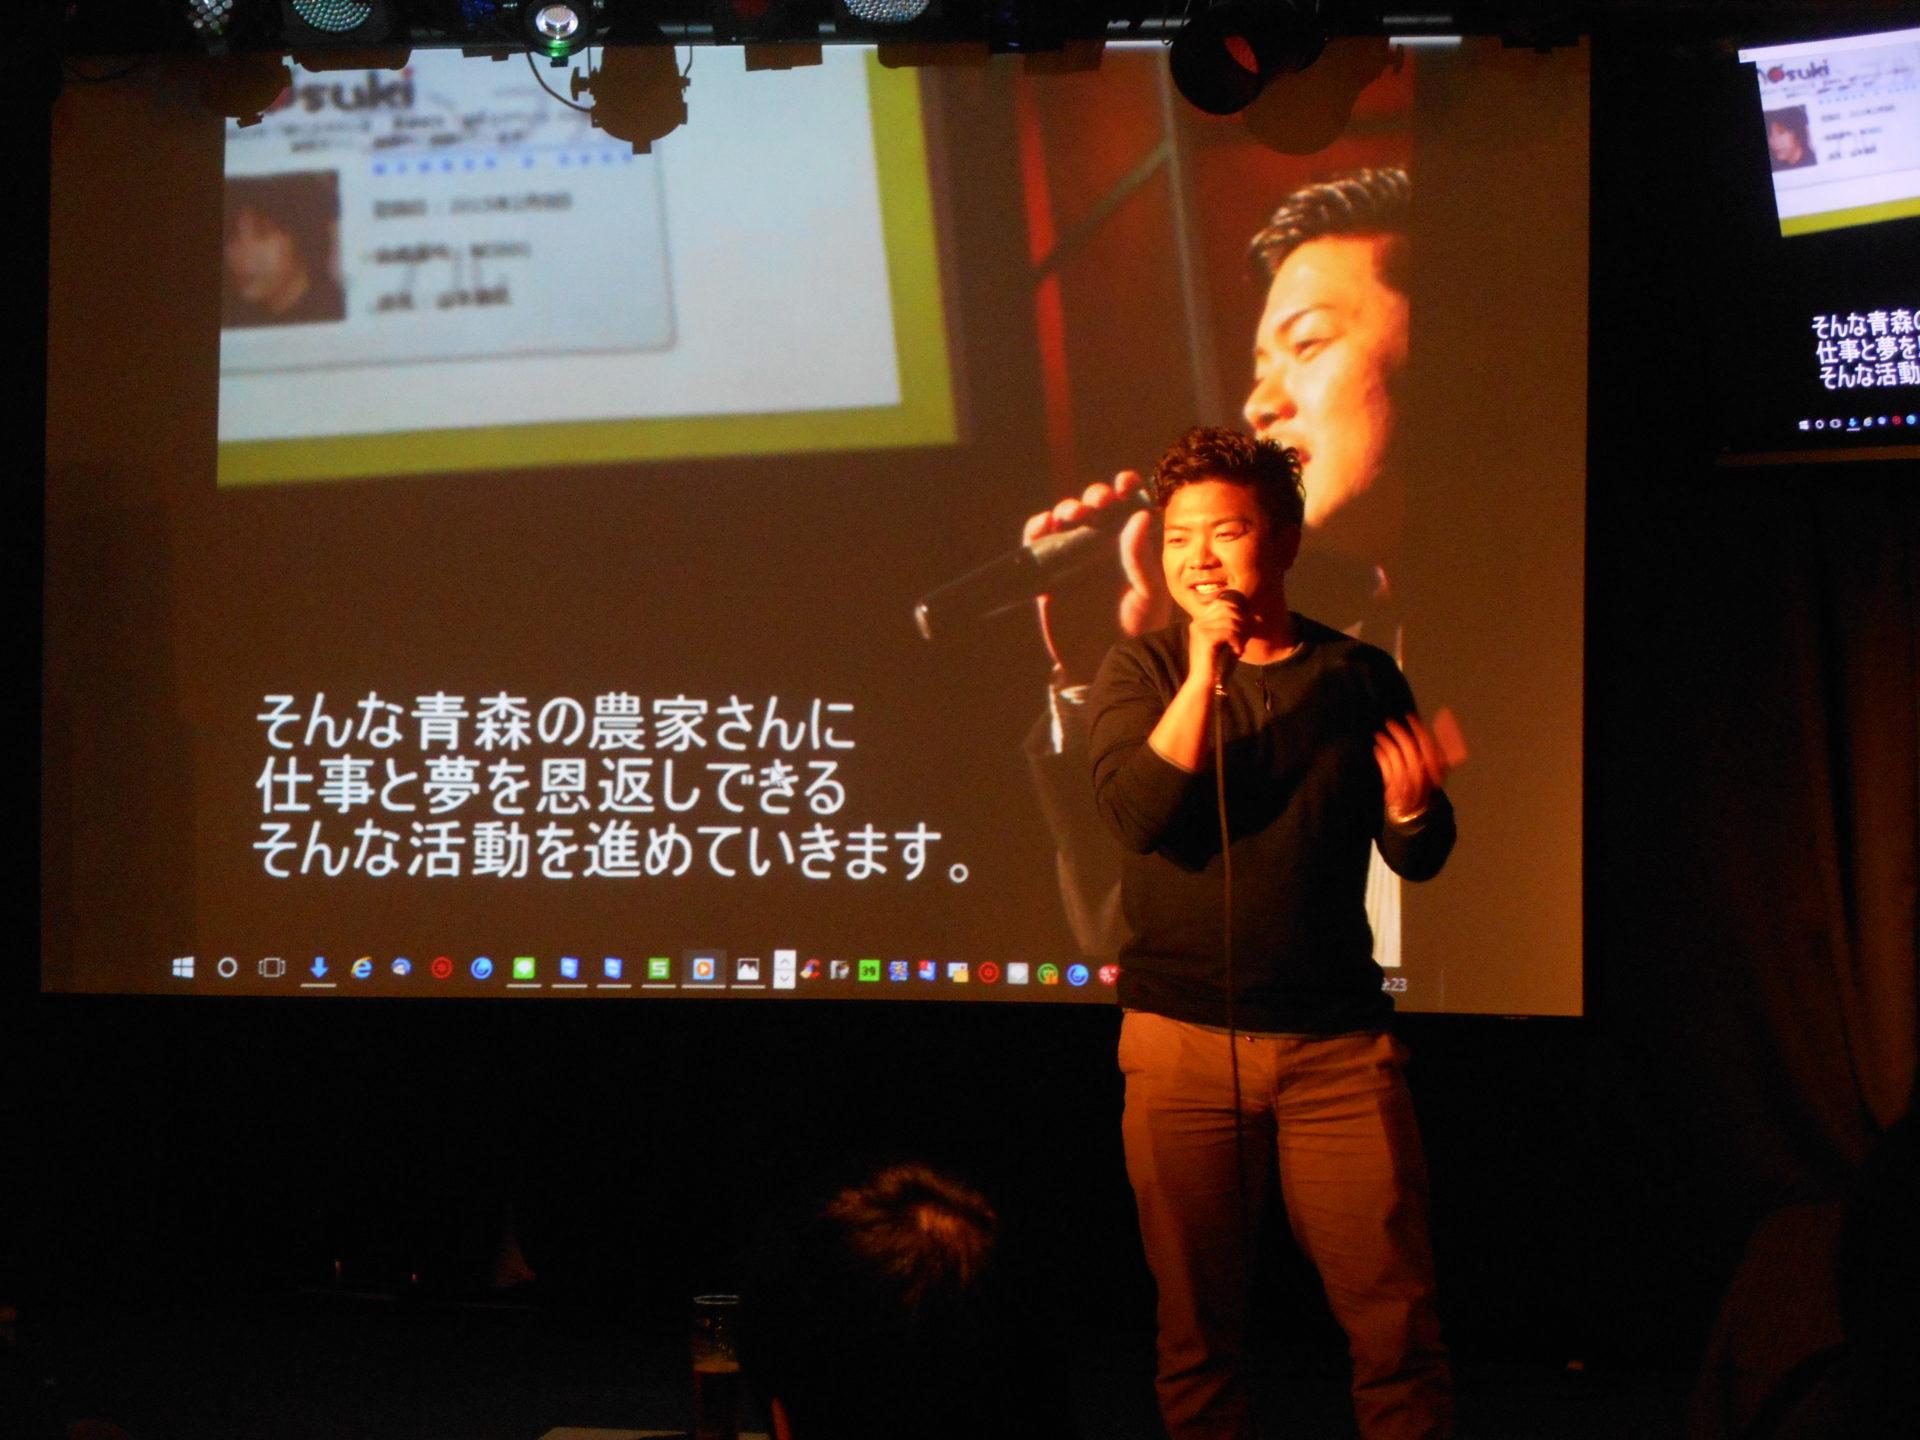 DSCN1028 1920x1440 - 2016年3月11日(金)AOsuki総会&パーティー開催しました。